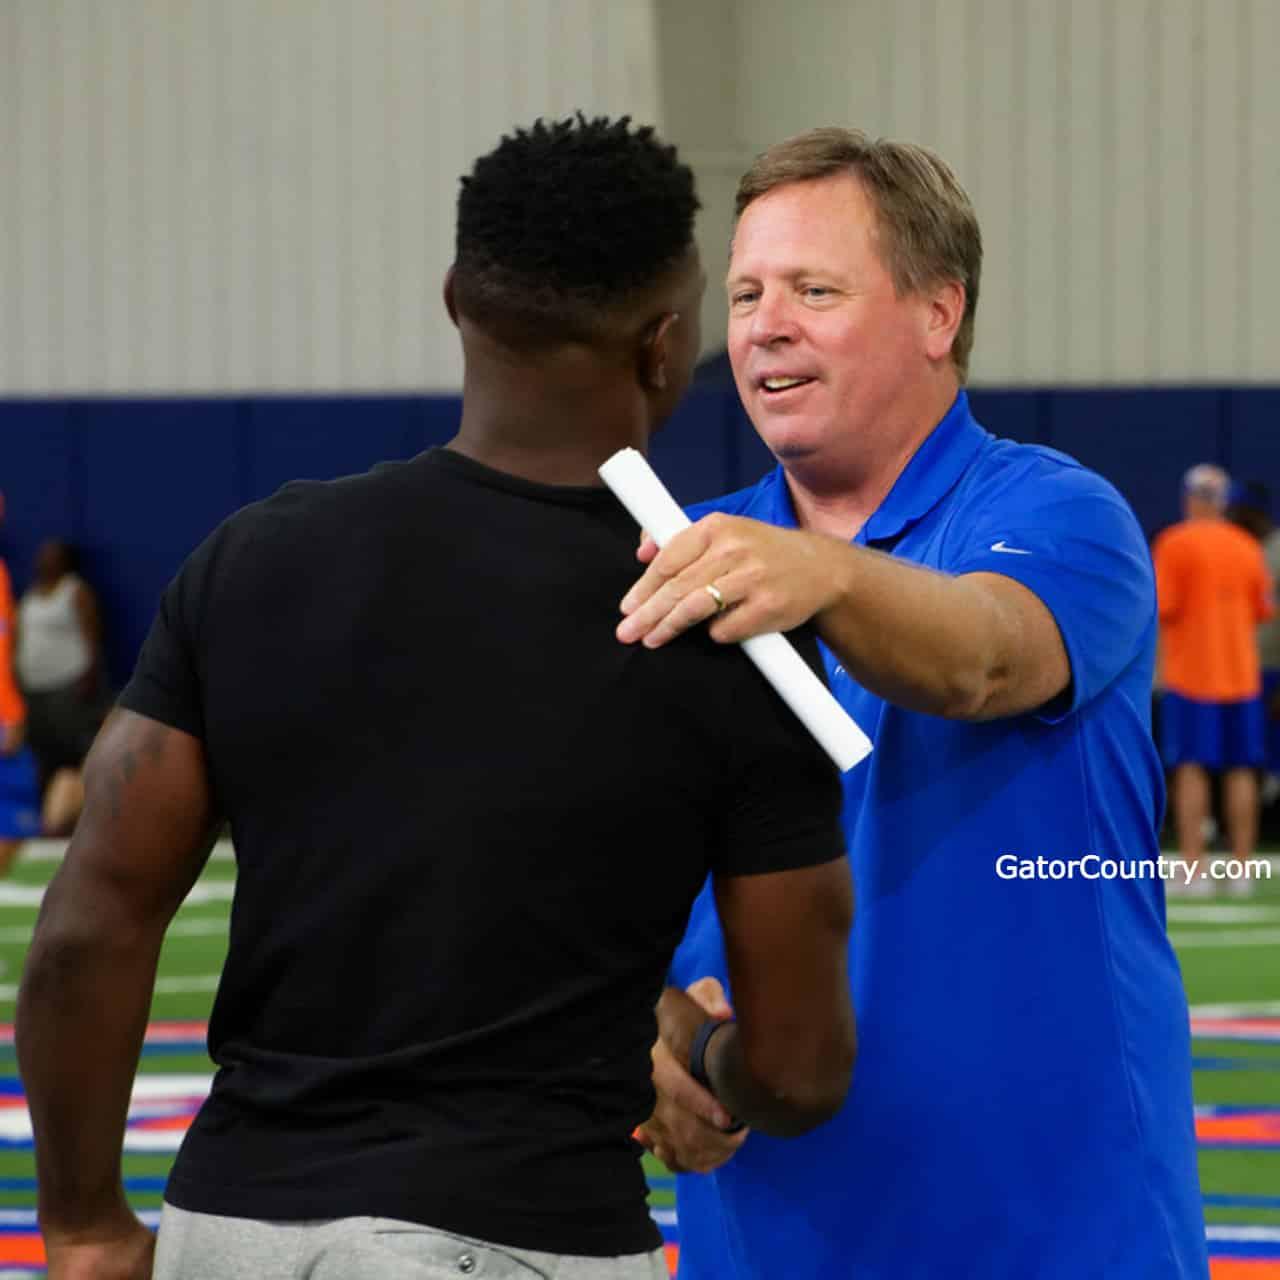 Florida-gators-recruiting-rb-target-dameon-pierce-and-jim-mcelwain